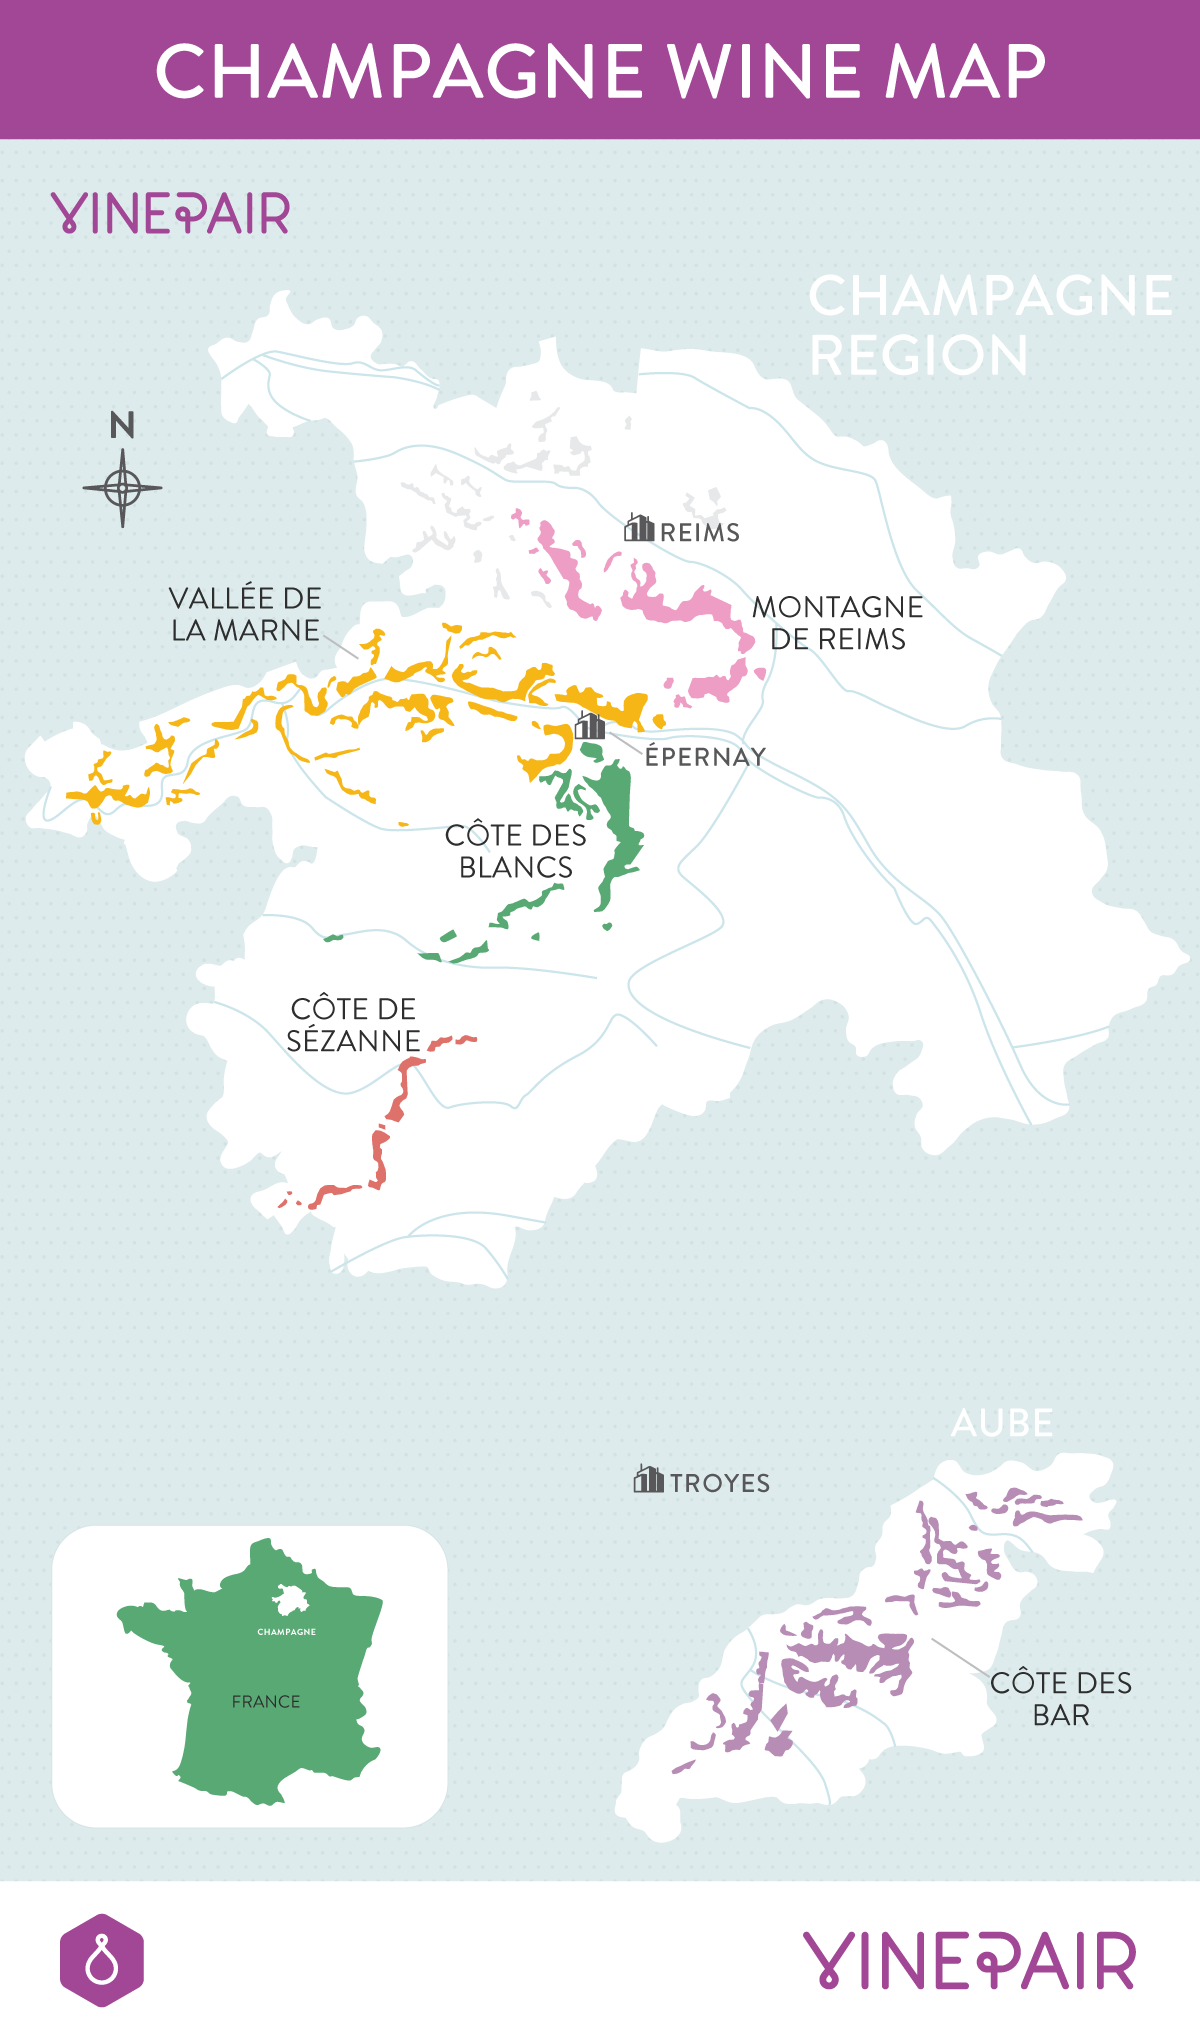 4-map-champagne-wine-region-2016-franklin-liquors